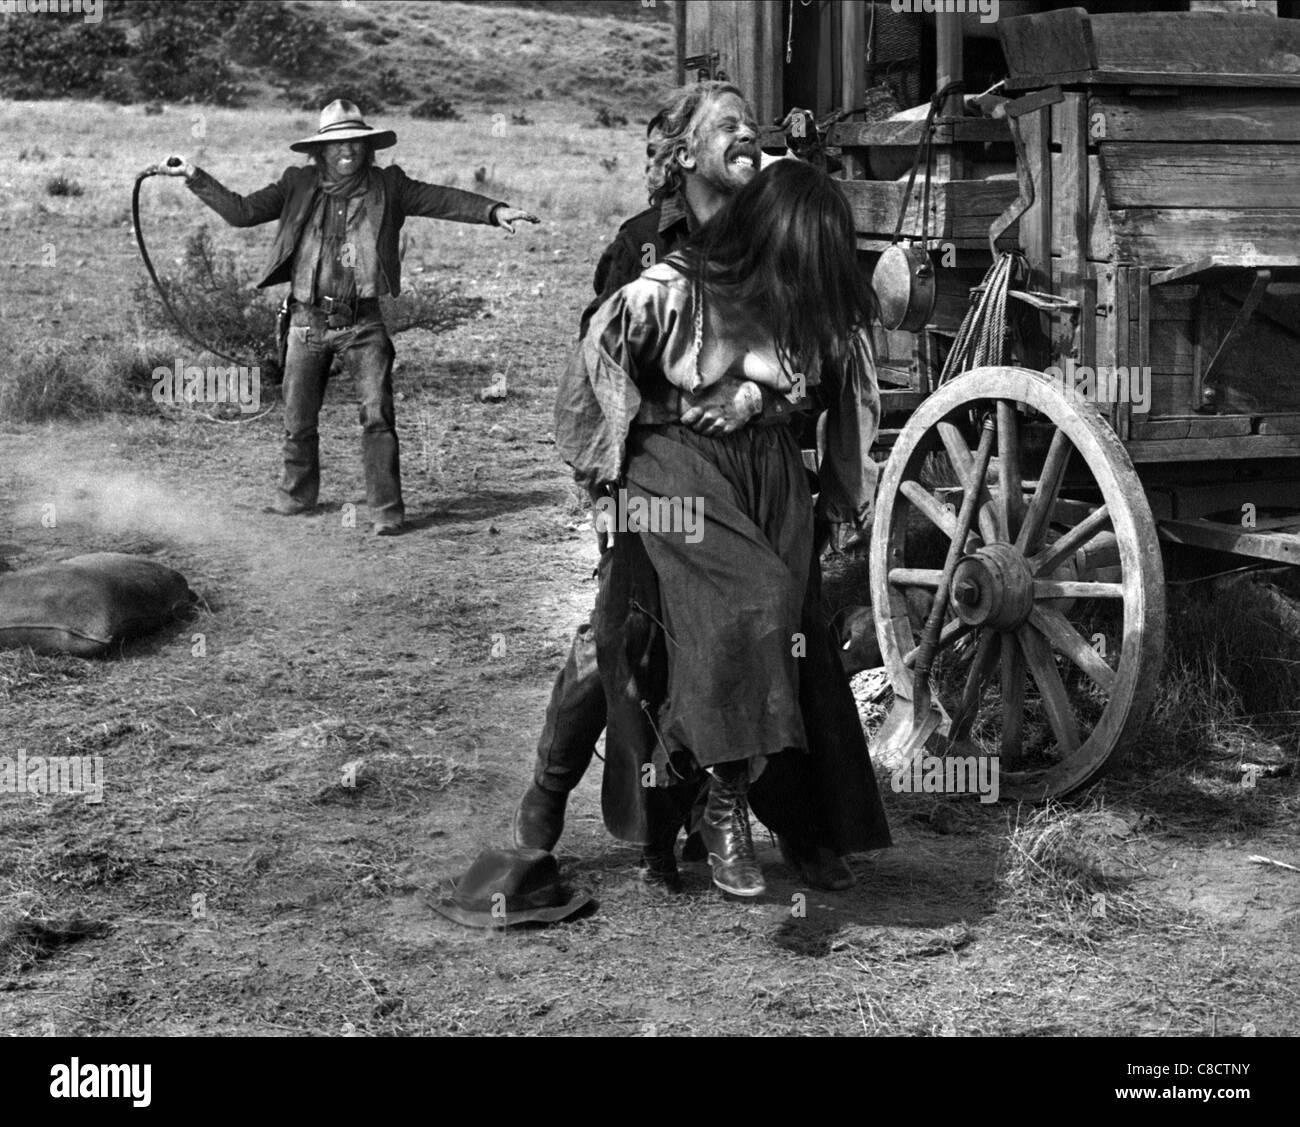 Pat Garrett And Billy The Kid Stock Photos & Pat Garrett And